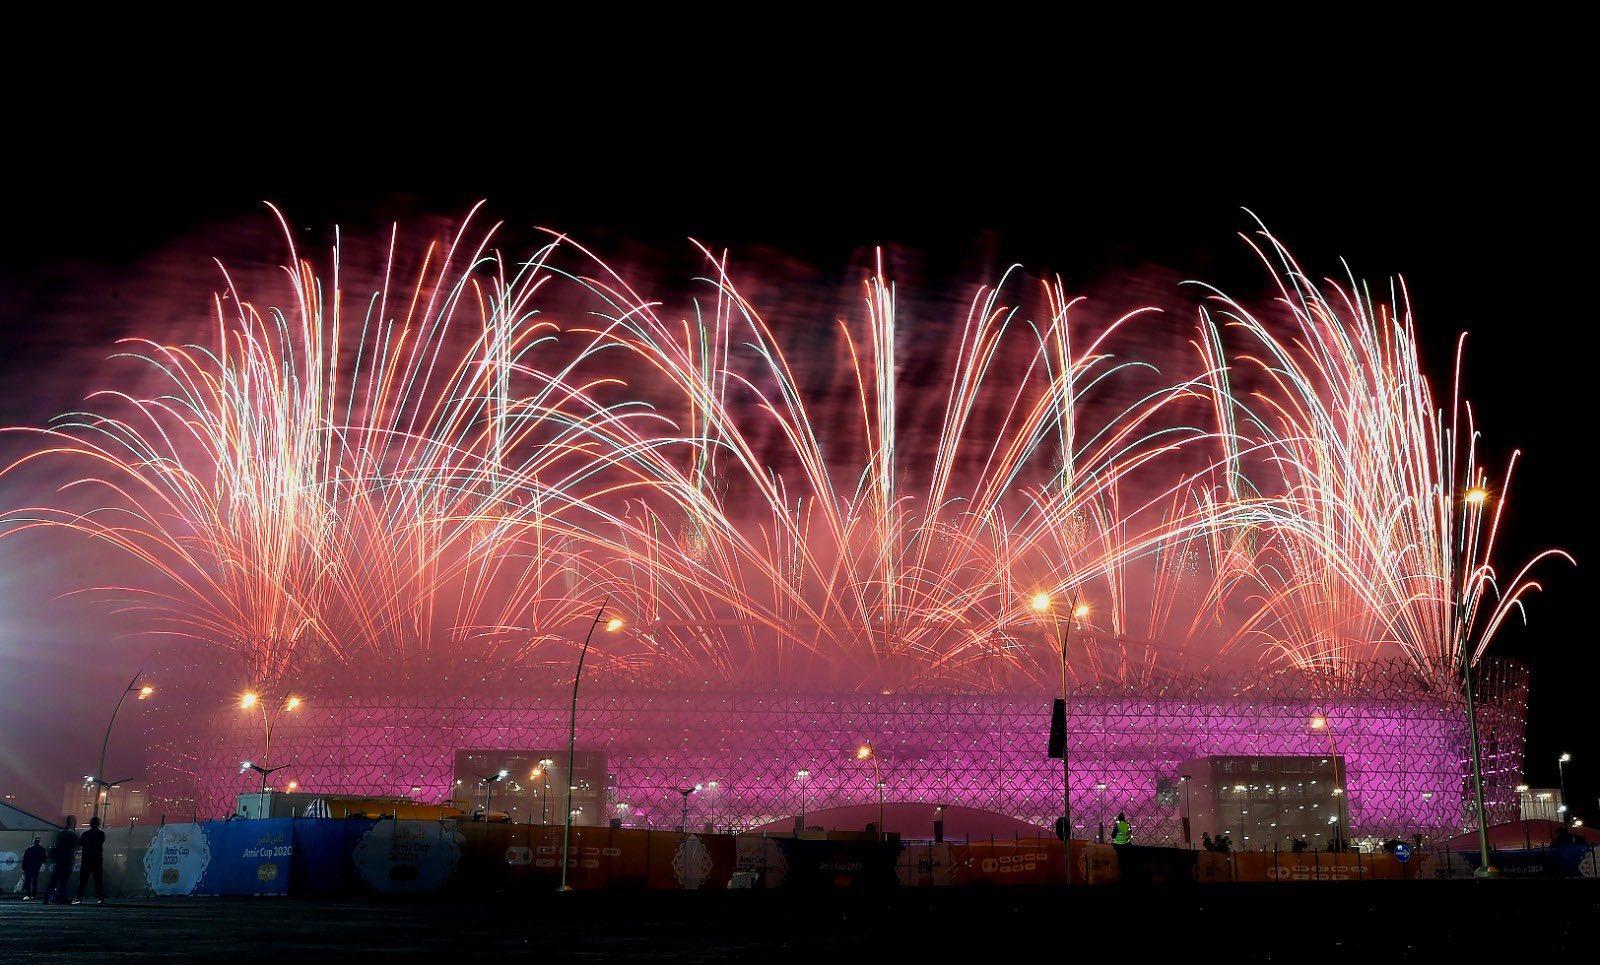 Qatar Inaugurates Fourth World Cup Stadium Amidst Celebrations